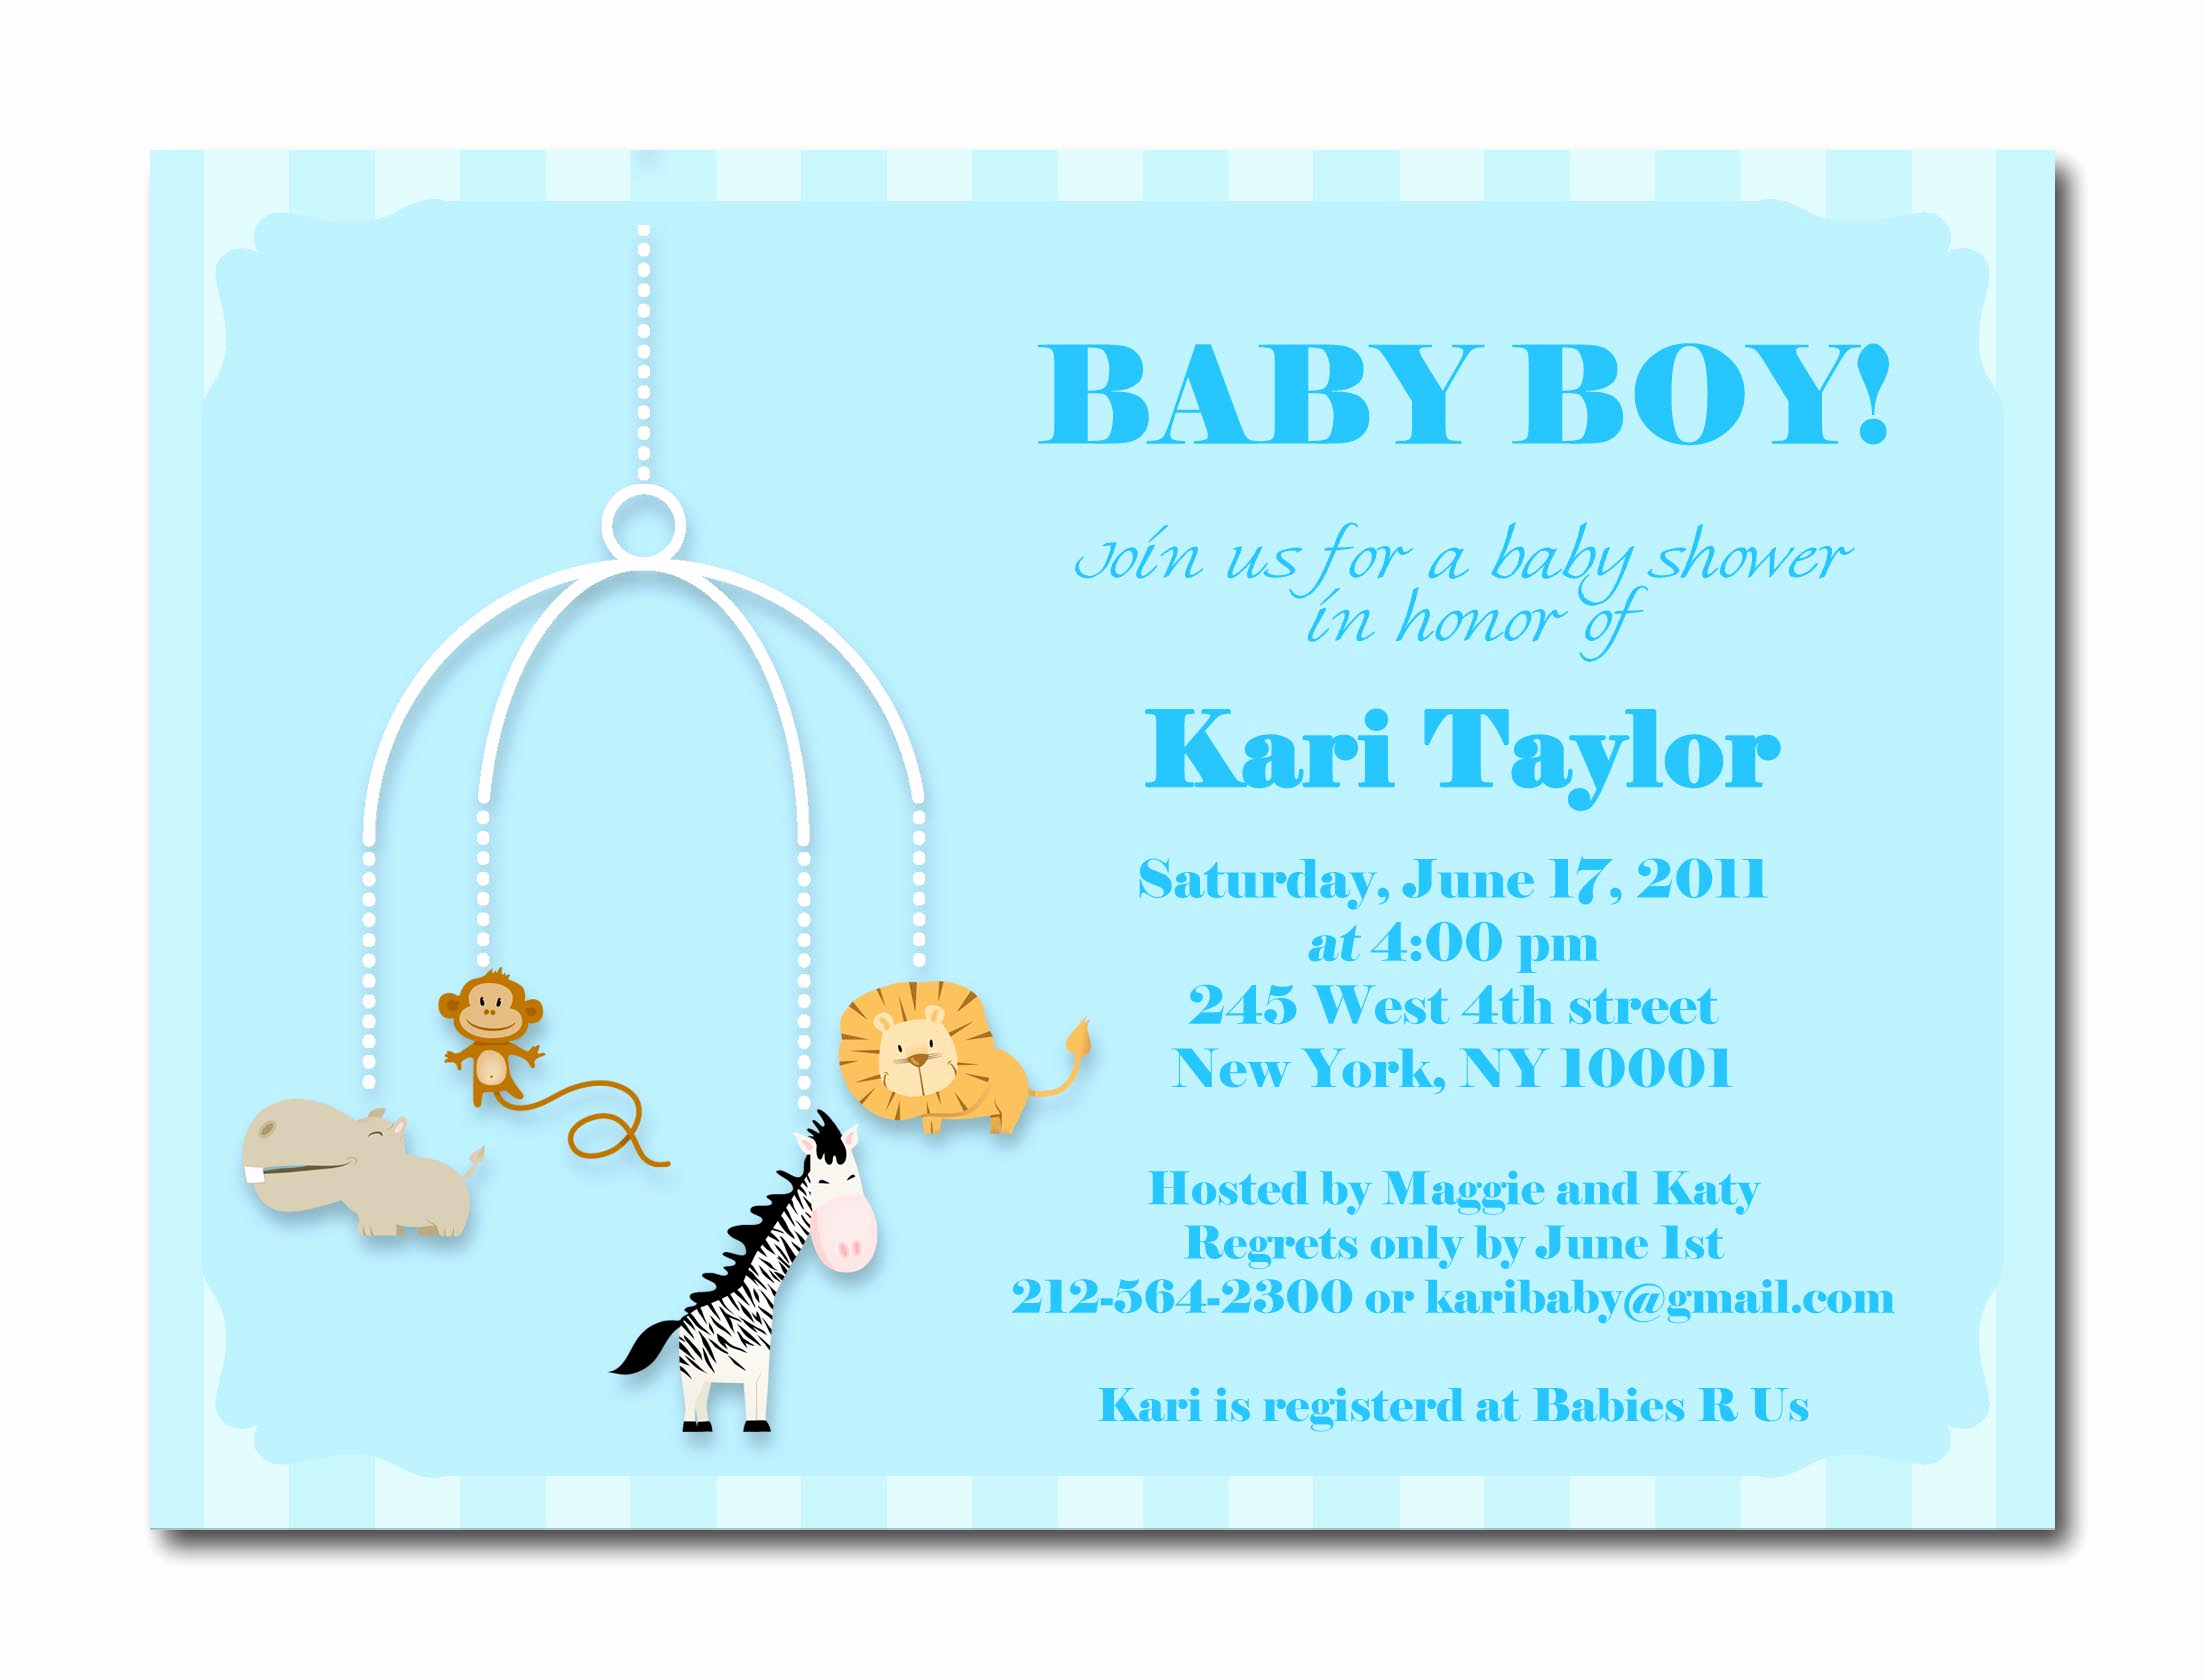 Baby Shower Invitation Examples Unique Baby Boy Shower Invites